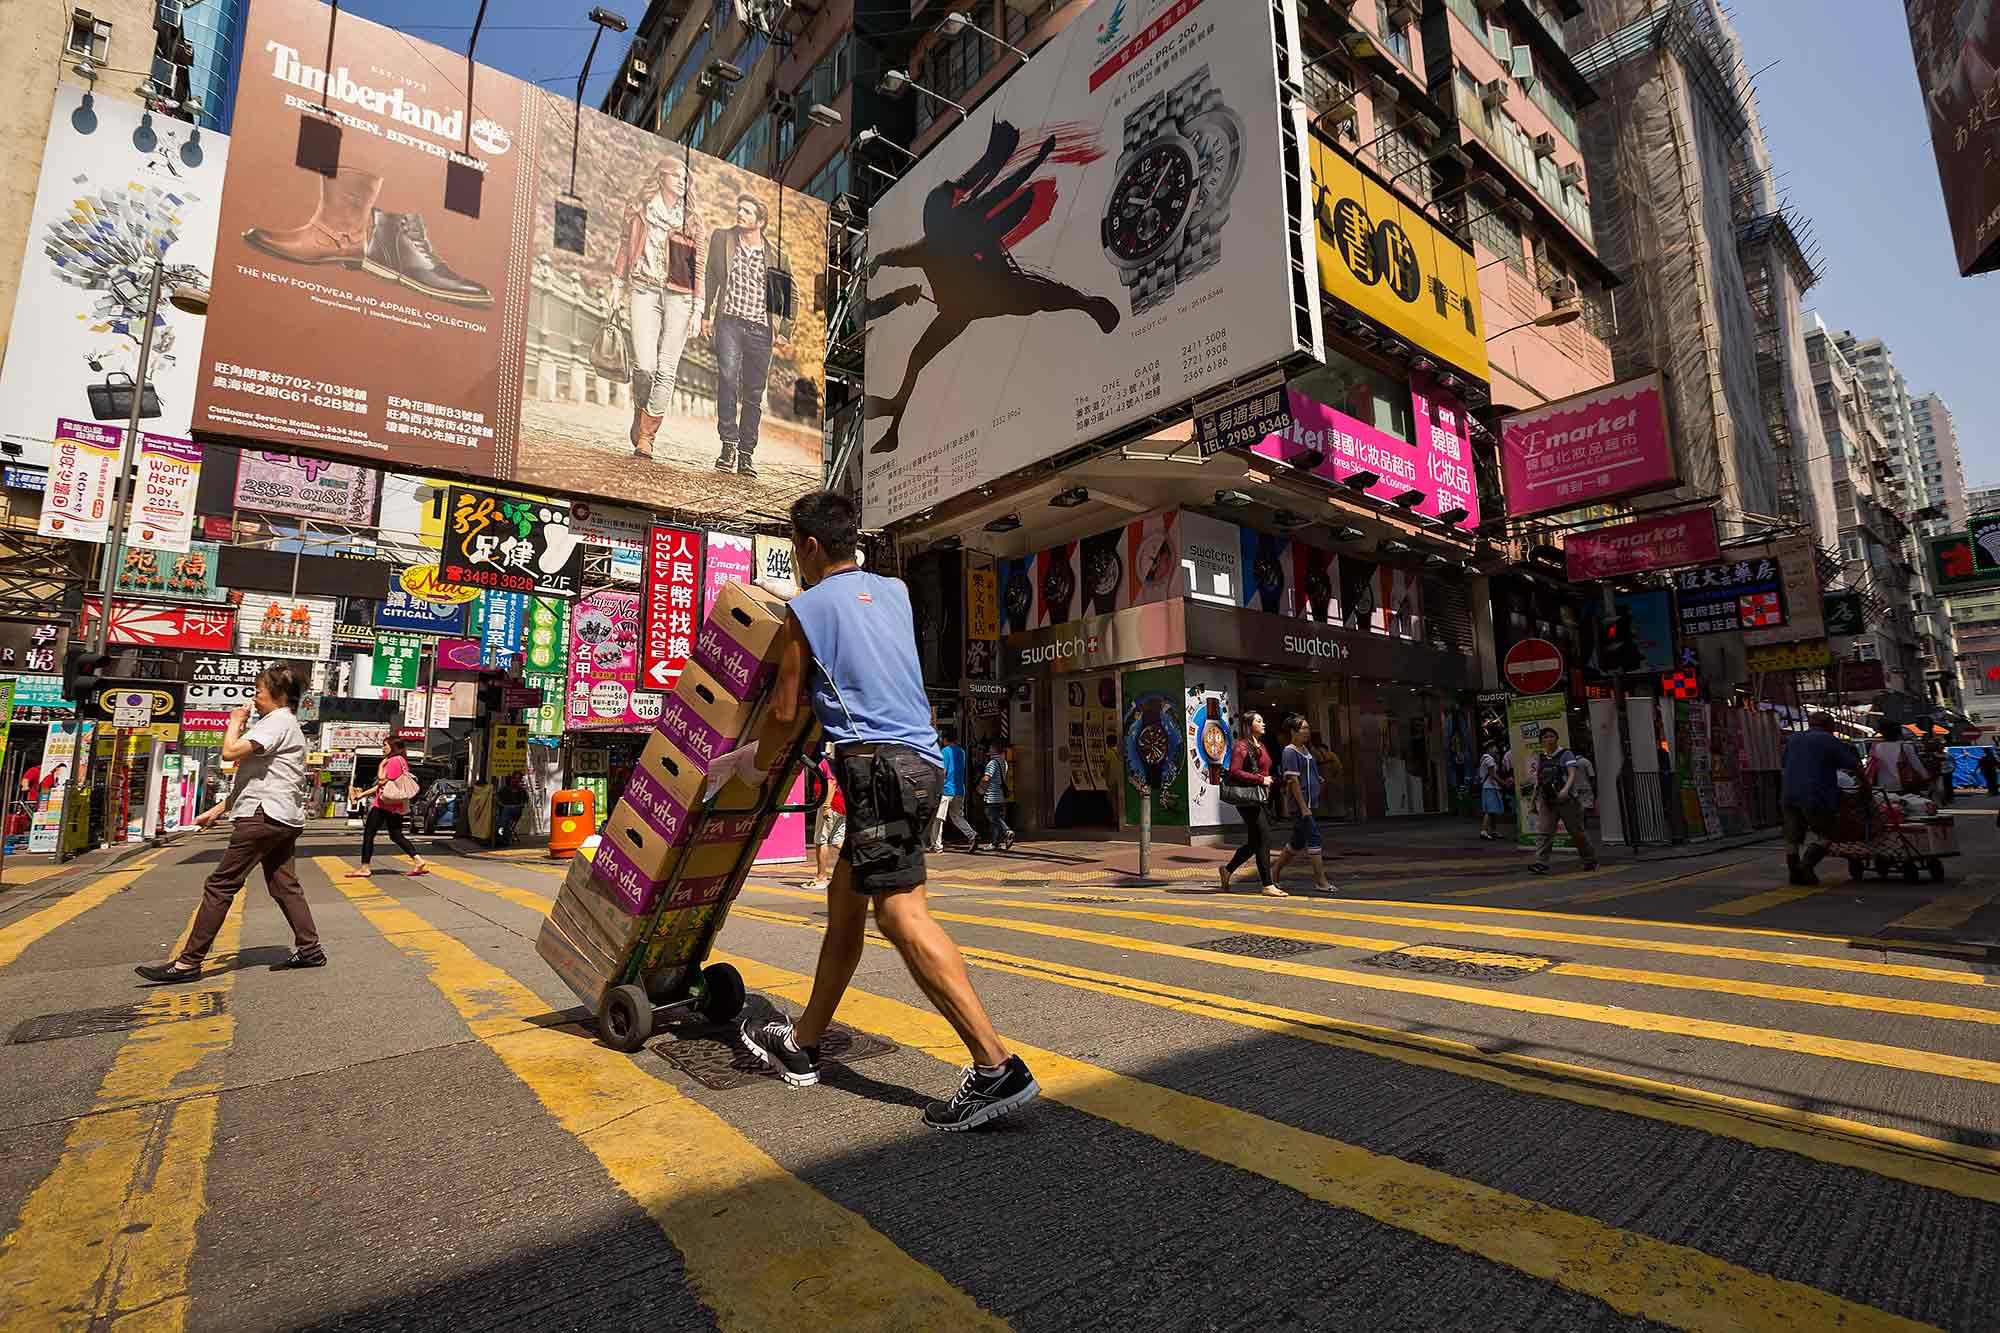 Colourful Mong Kok street life in Hong Kong. © Ulli Maier & Nisa Maier